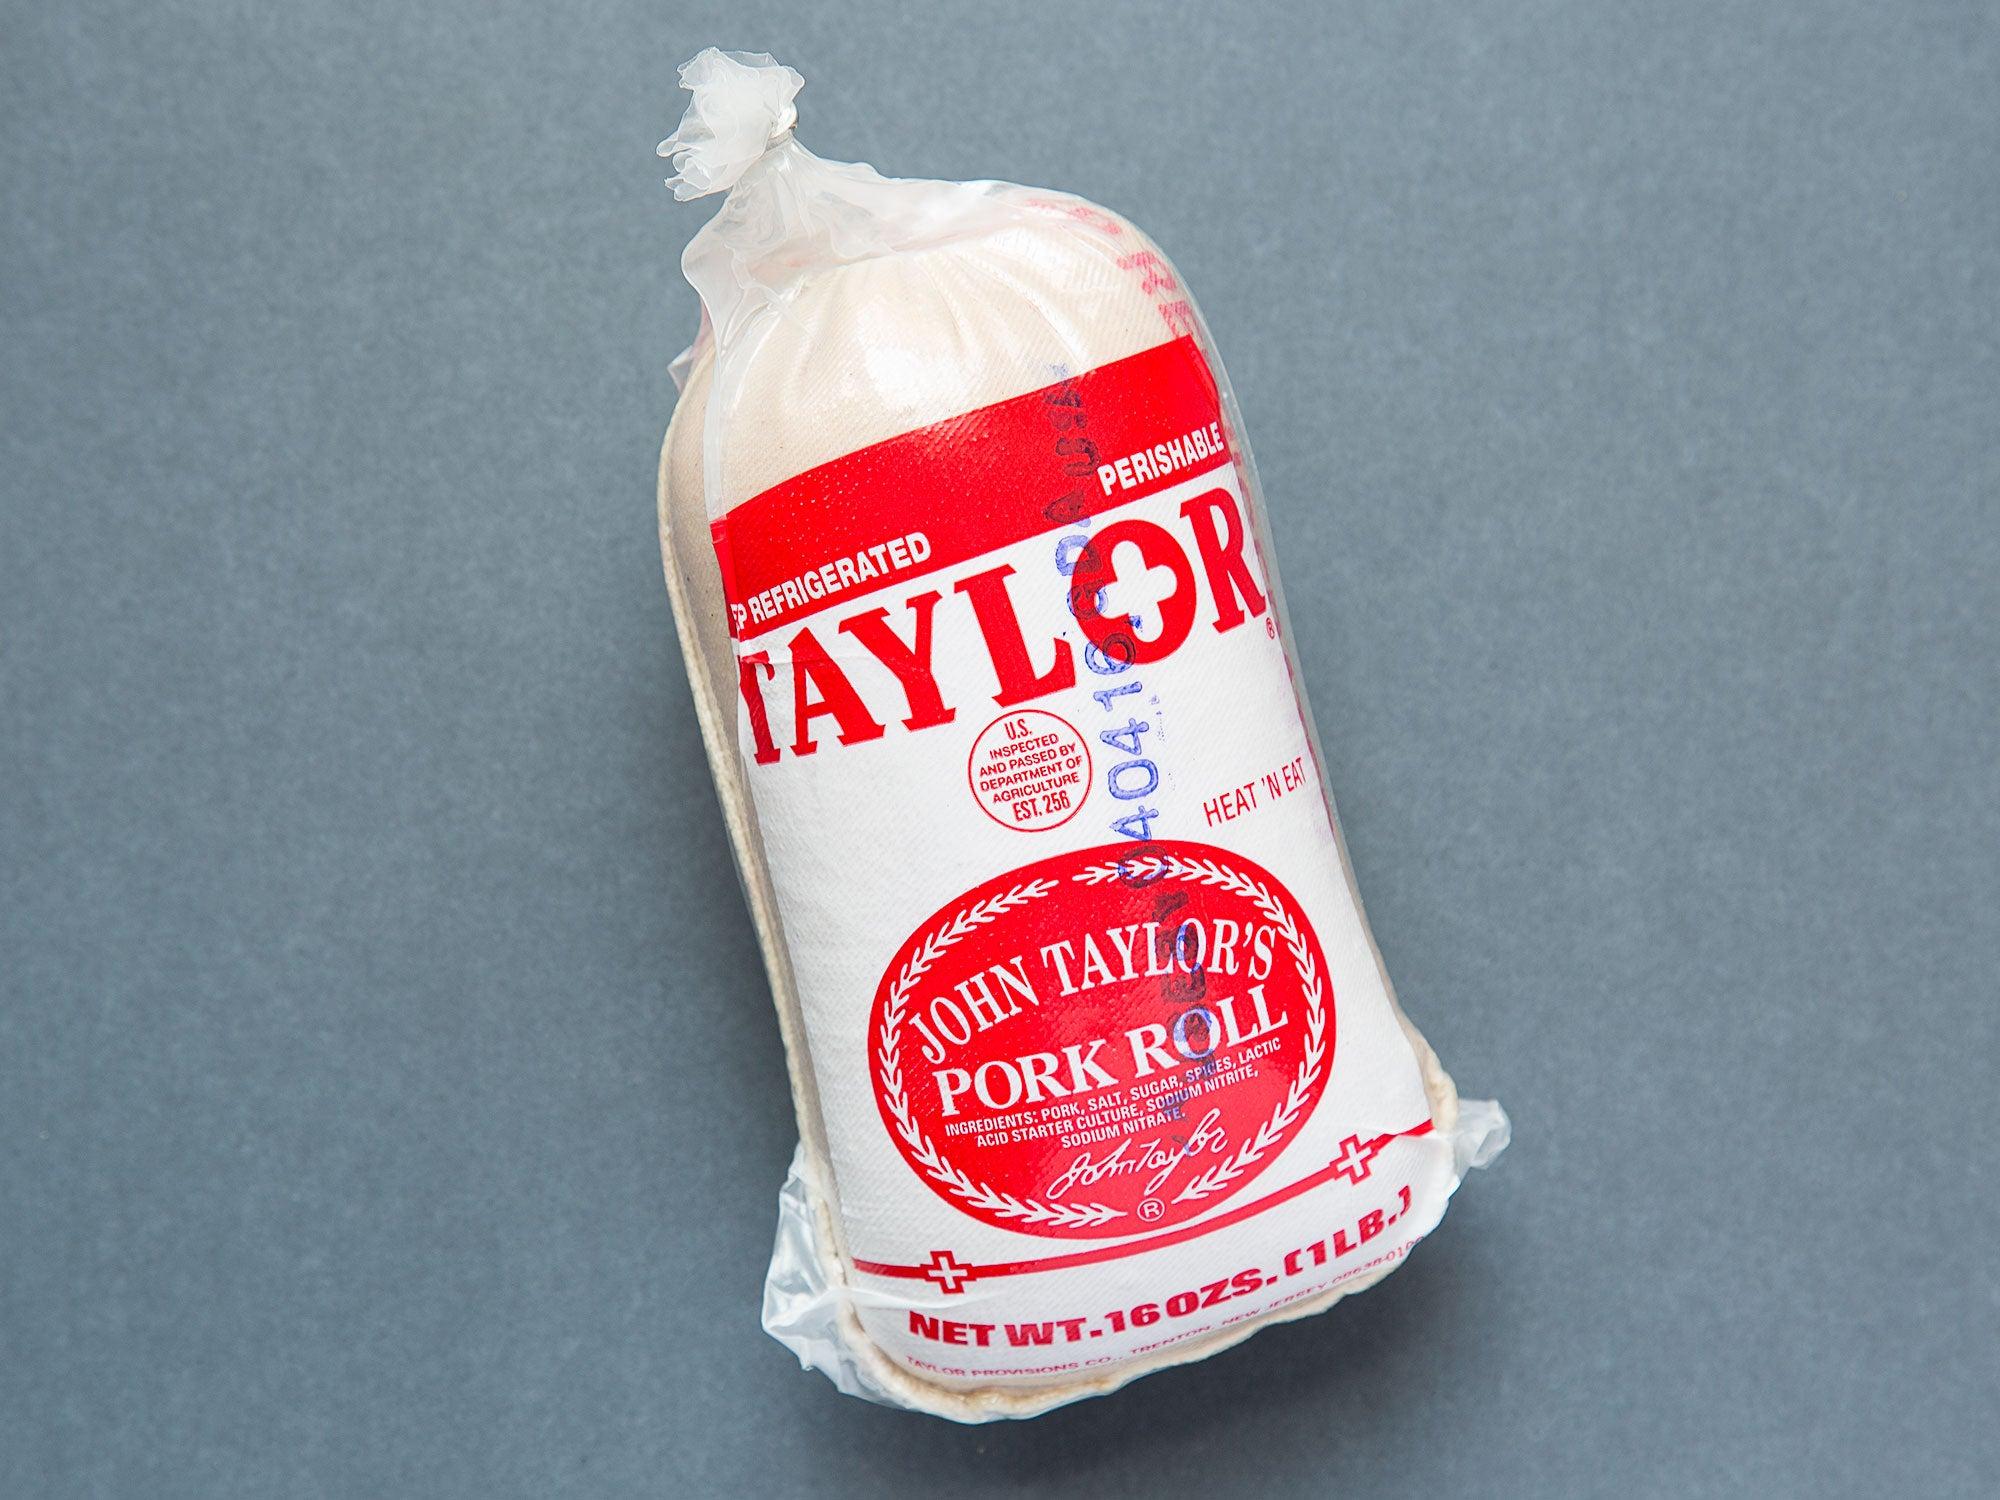 Jersey Pork Roll